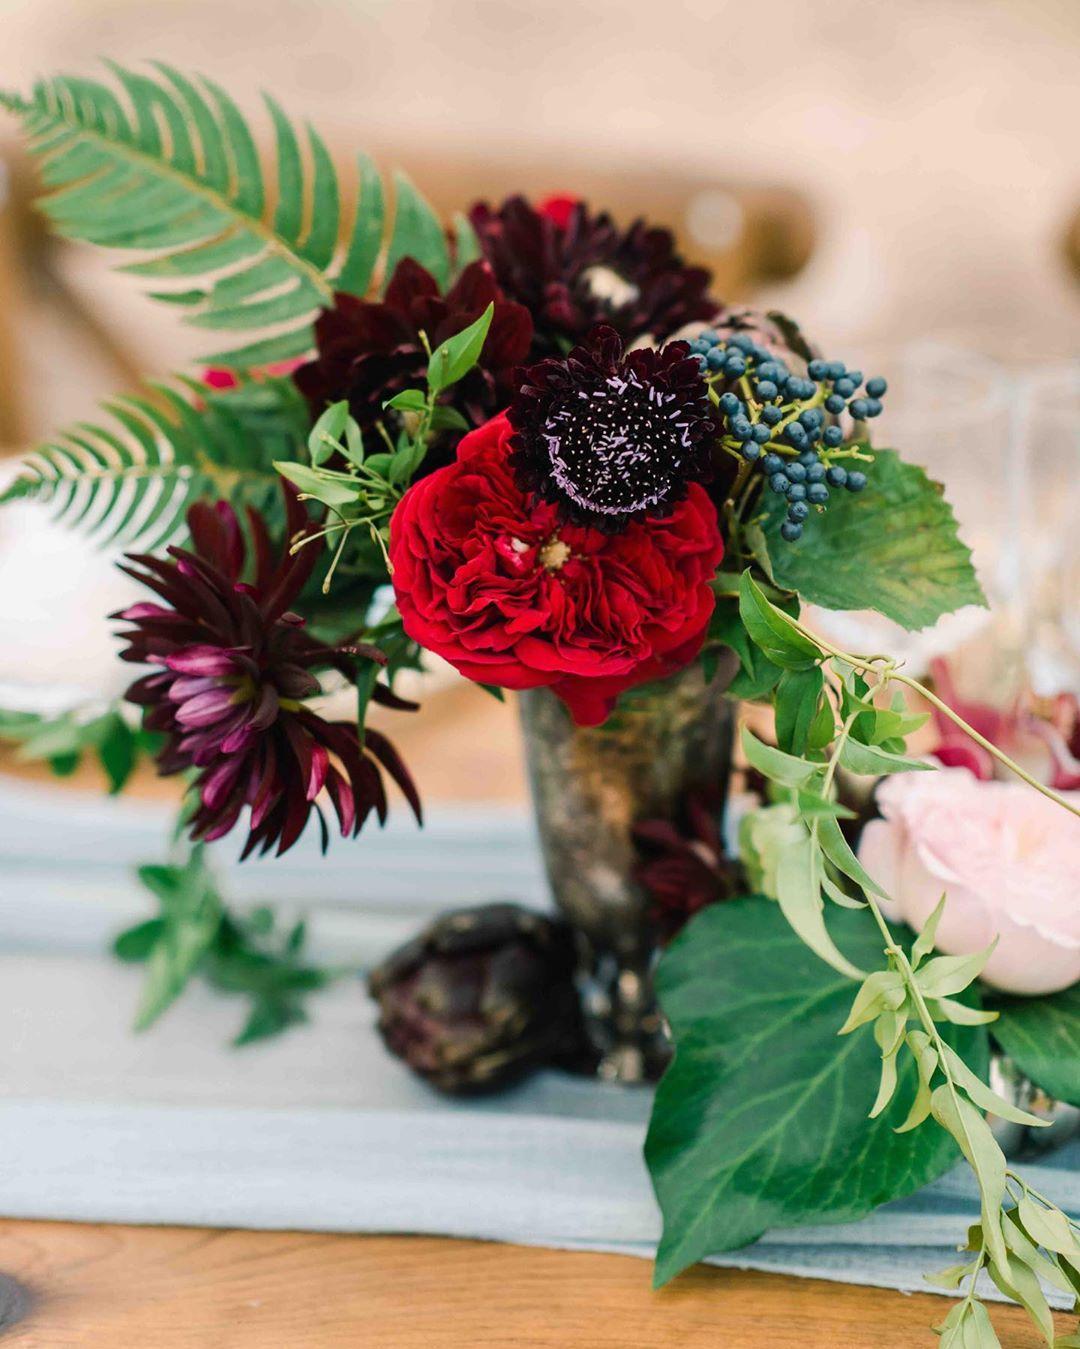 {ain't she sweet} photo | @jennidarling  planning/design | @nhwedplanner . . #flowers #wedding #centerpiece #weddingdesign #prettyflowers #tablescape #dramatic #weddingflowers #nhwedding #lakesregionwedding #lotusfloraldesigns #forever #love